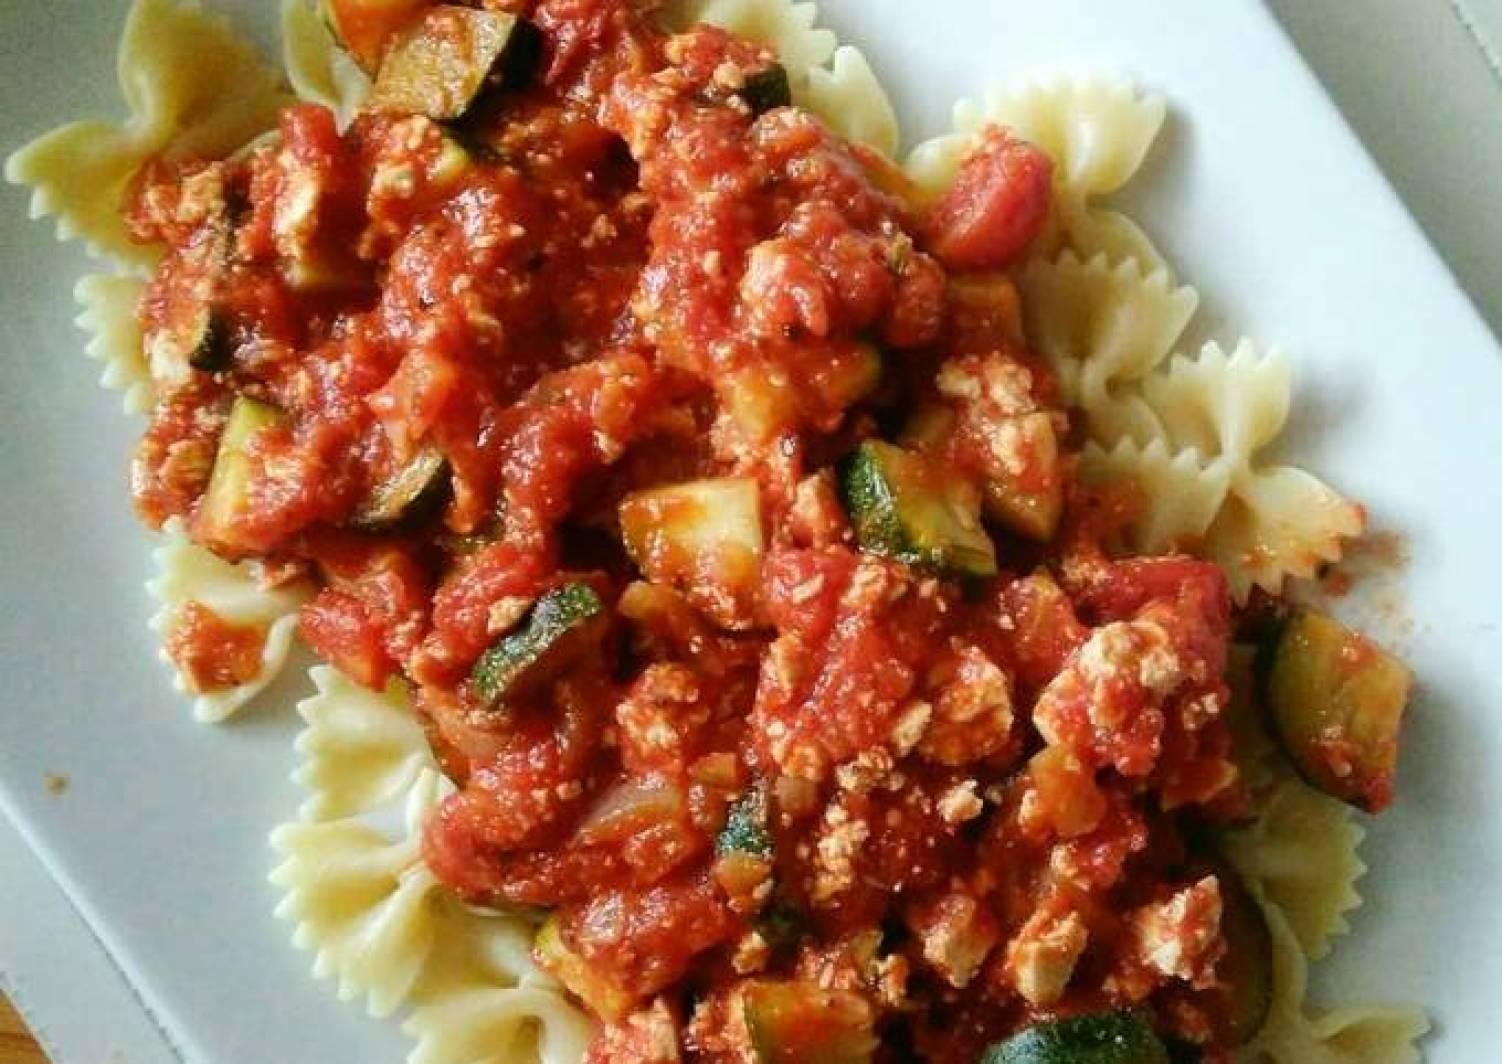 Tomato sauce with tofu and zucchini